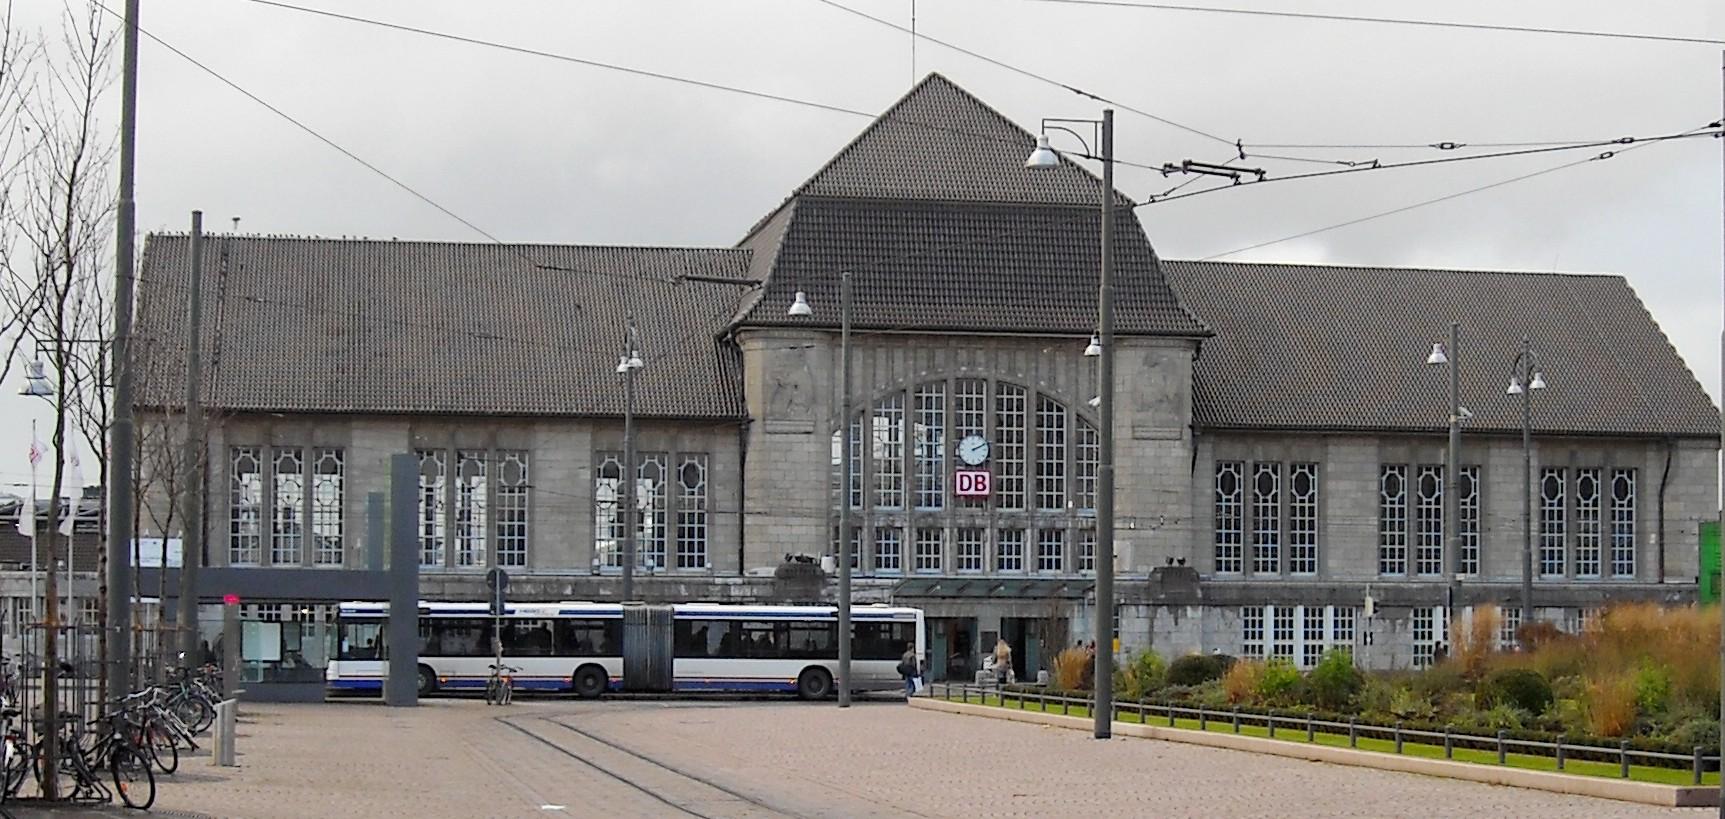 FileDarmstadt Hauptbahnhof front 20081205jpg Wikimedia Commons